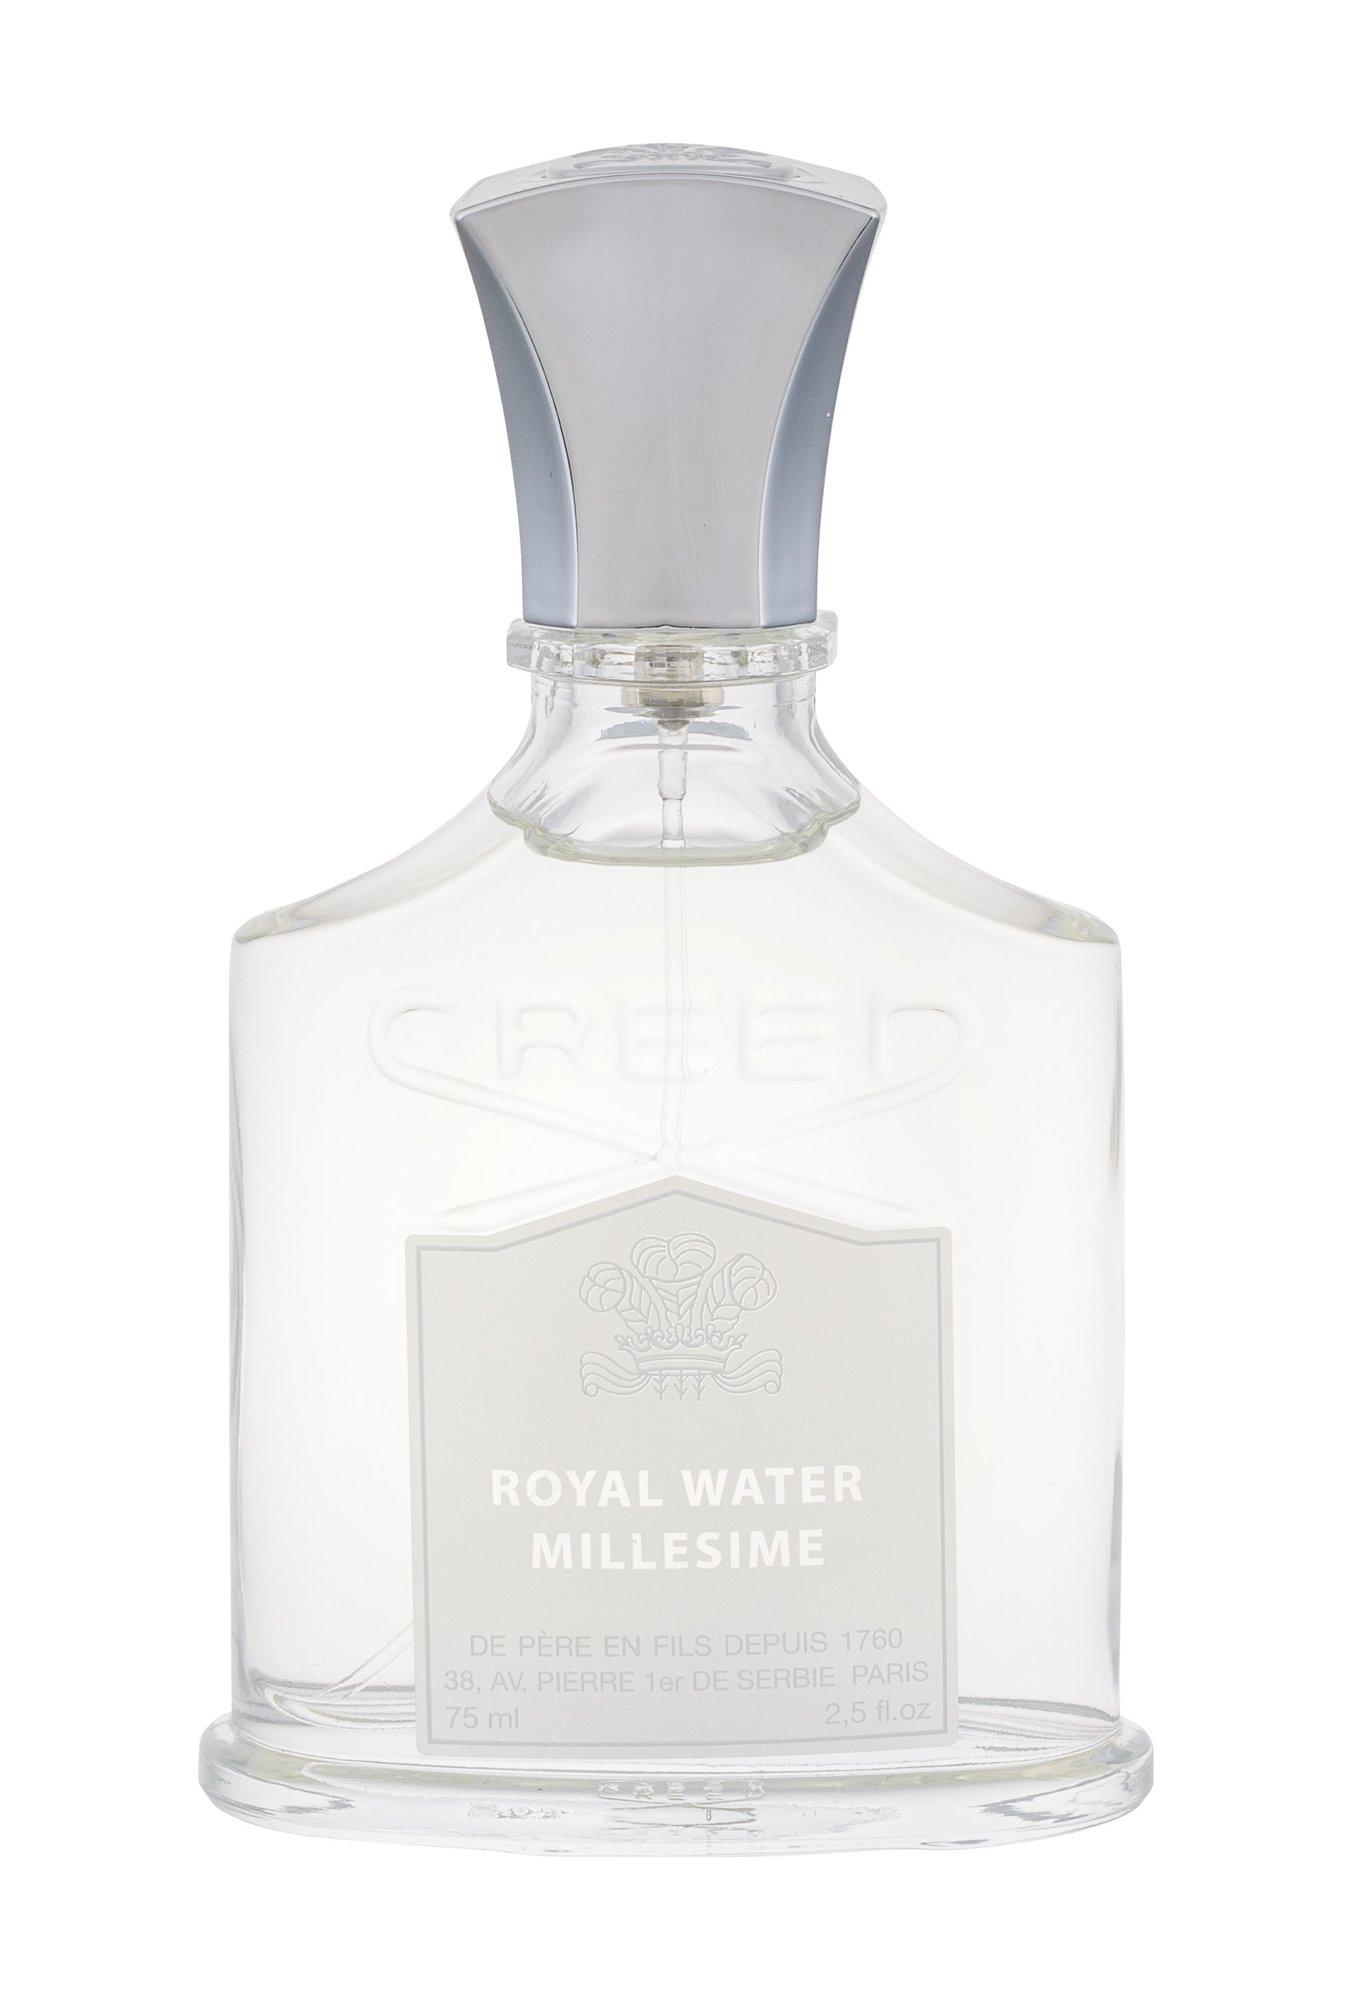 Creed Royal Water Eau de Parfum 75ml